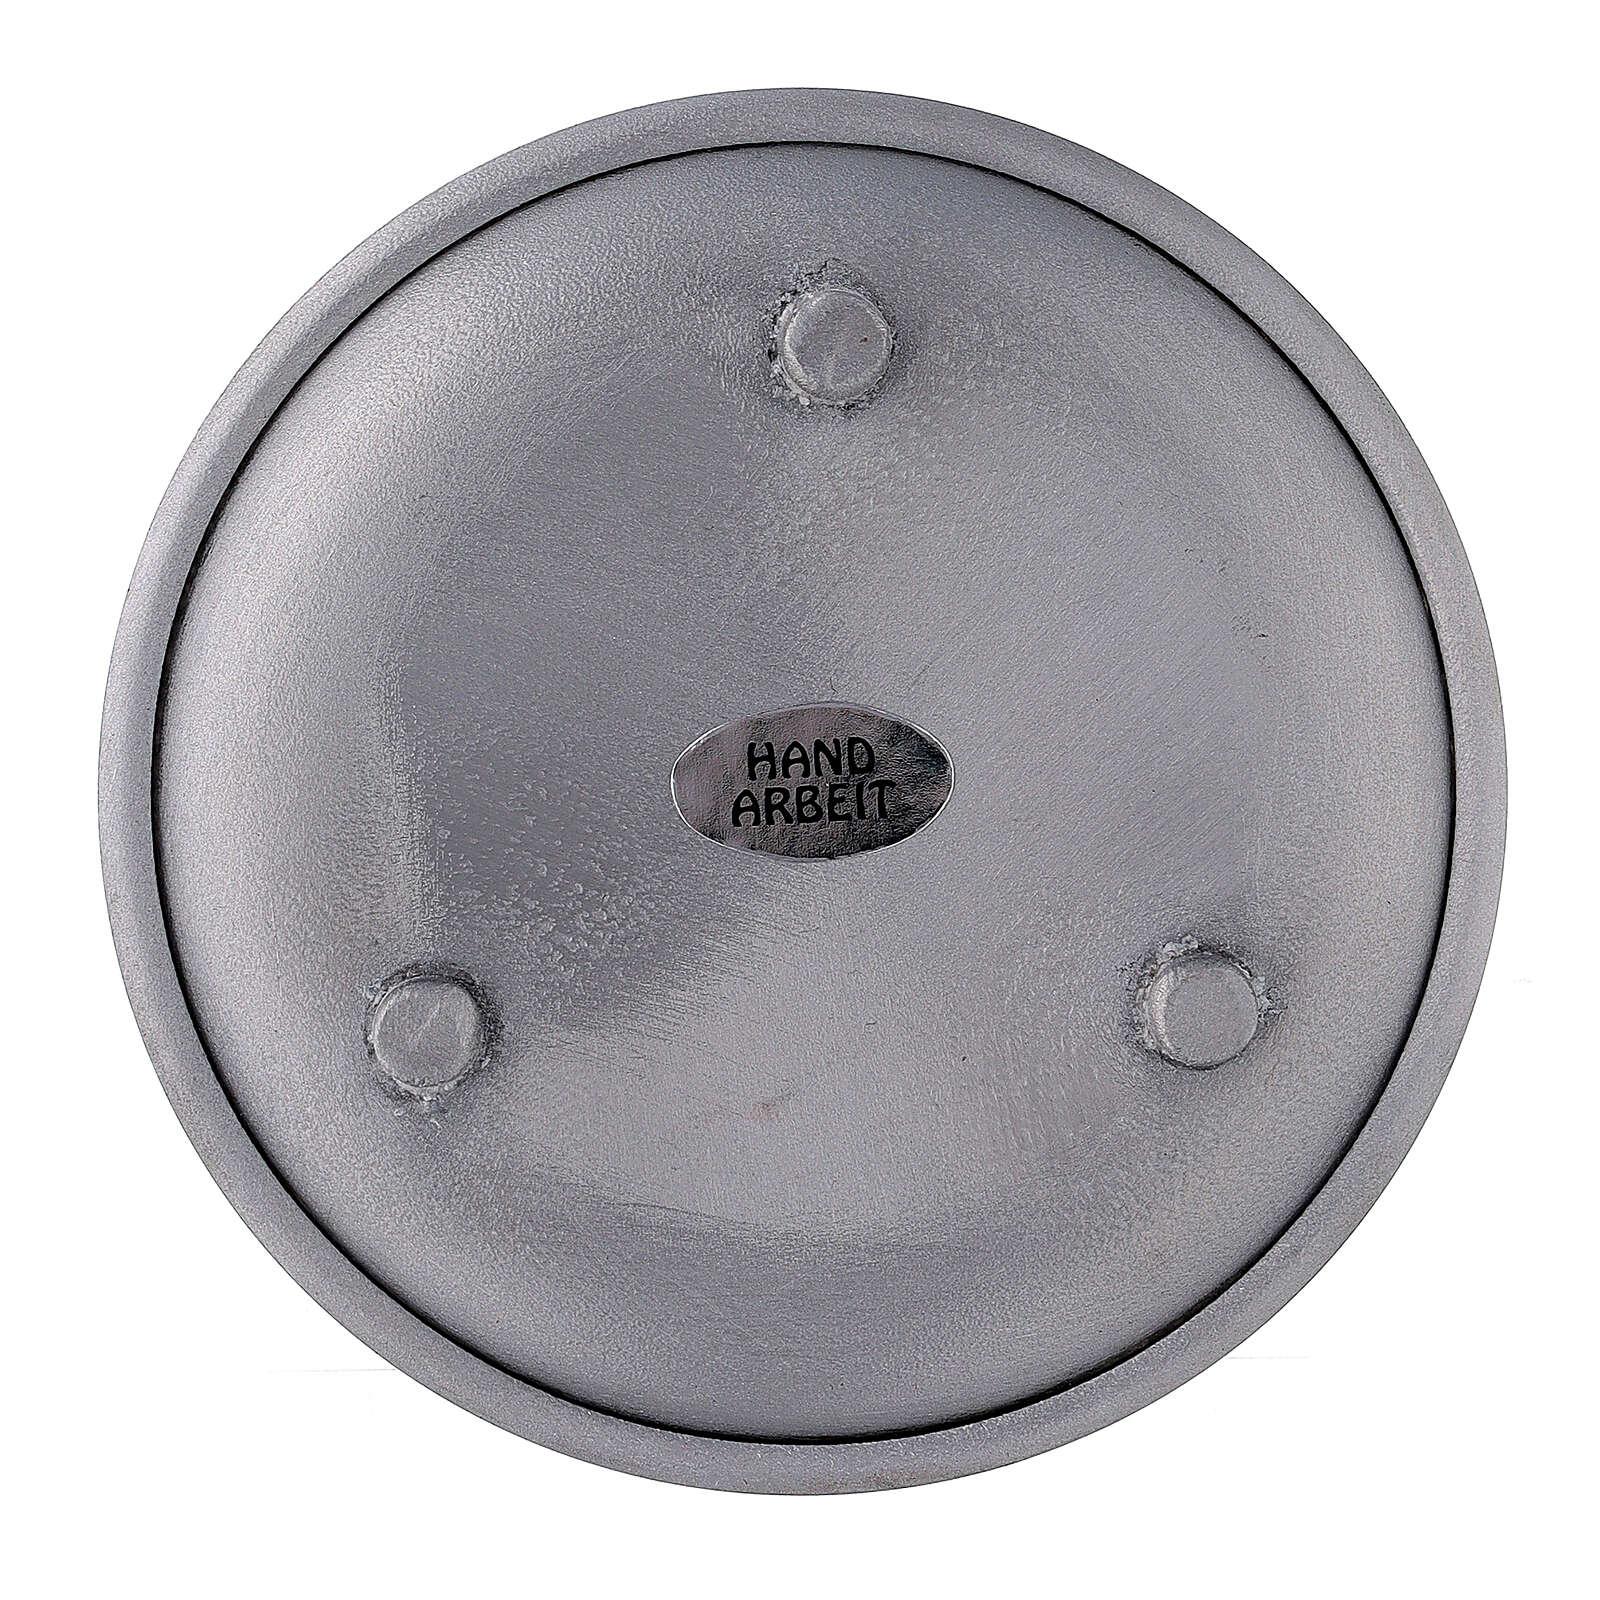 Aluminium candle holder raised edges and feet 4 in 3